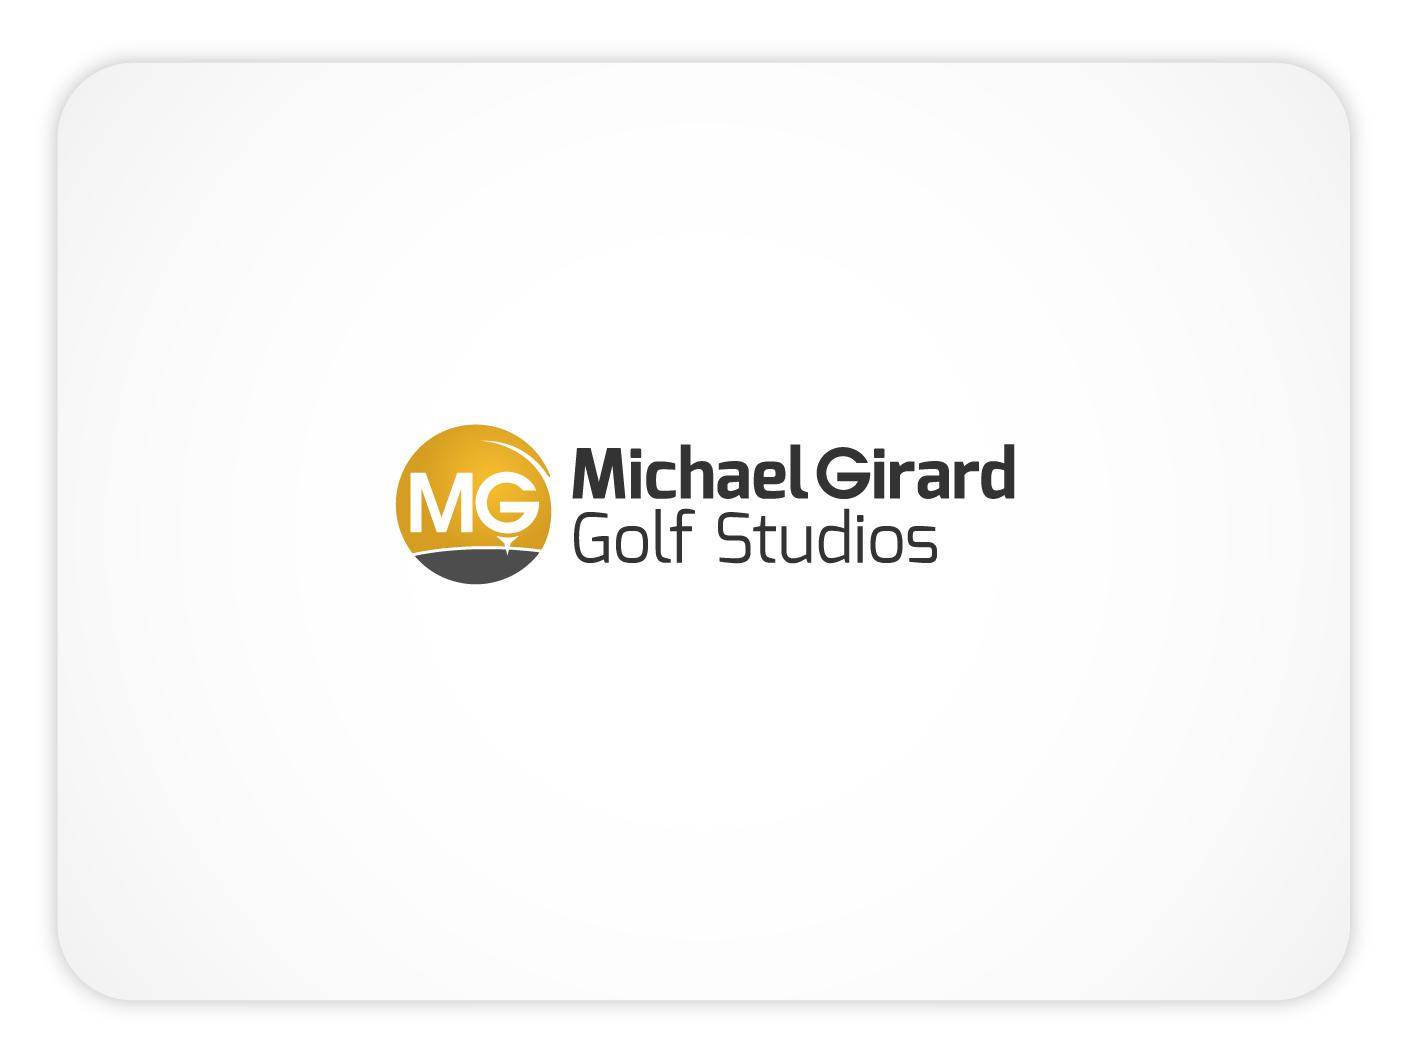 Michael Girard Golf Sudios needs a new logo